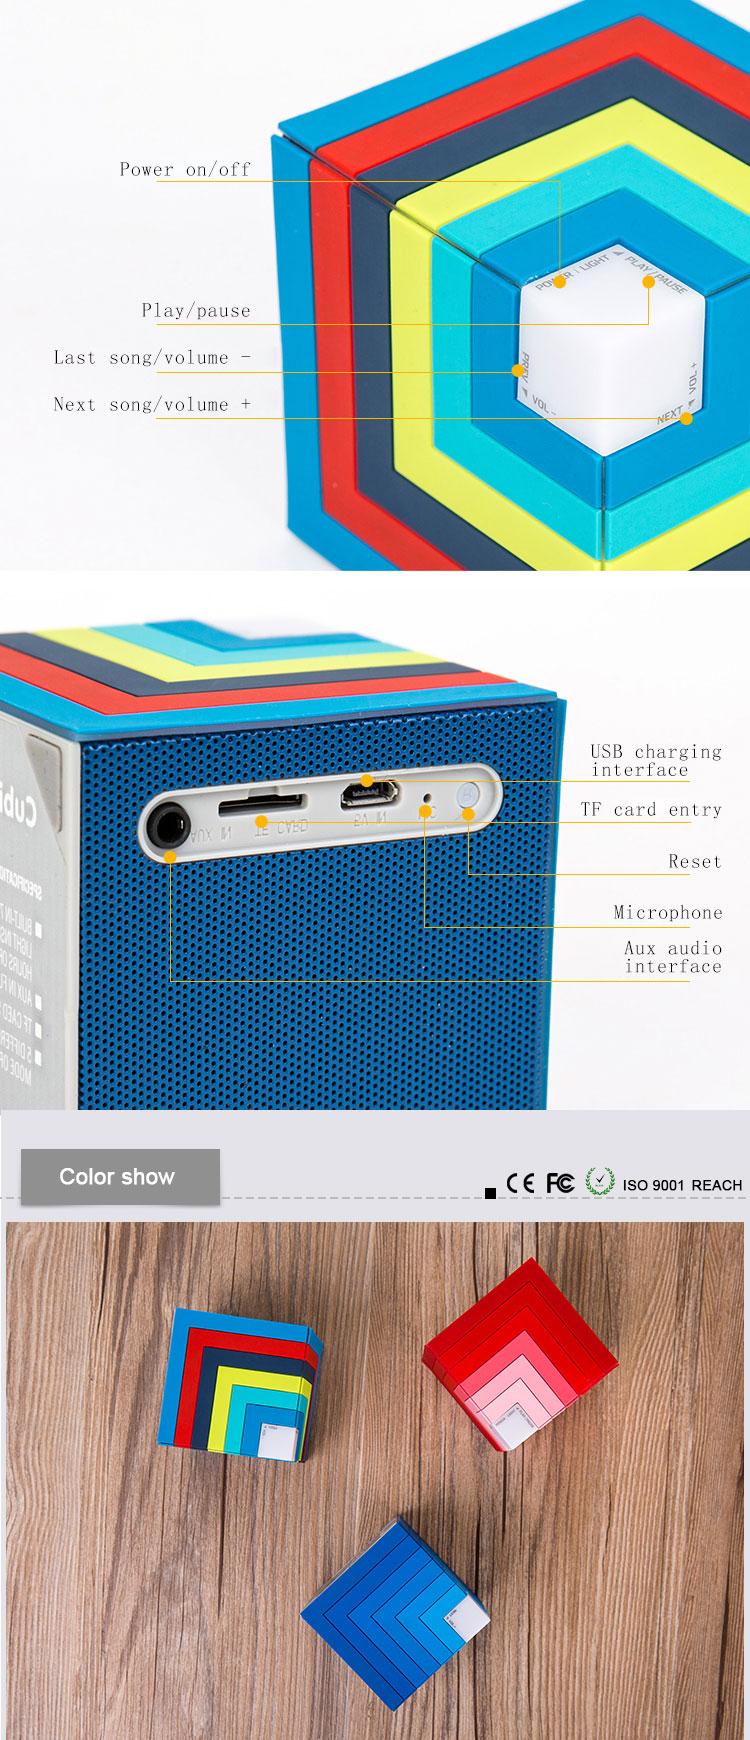 LED Portable Speaker Rainbow Wireless Bass Speaker With USB FM Radio GW